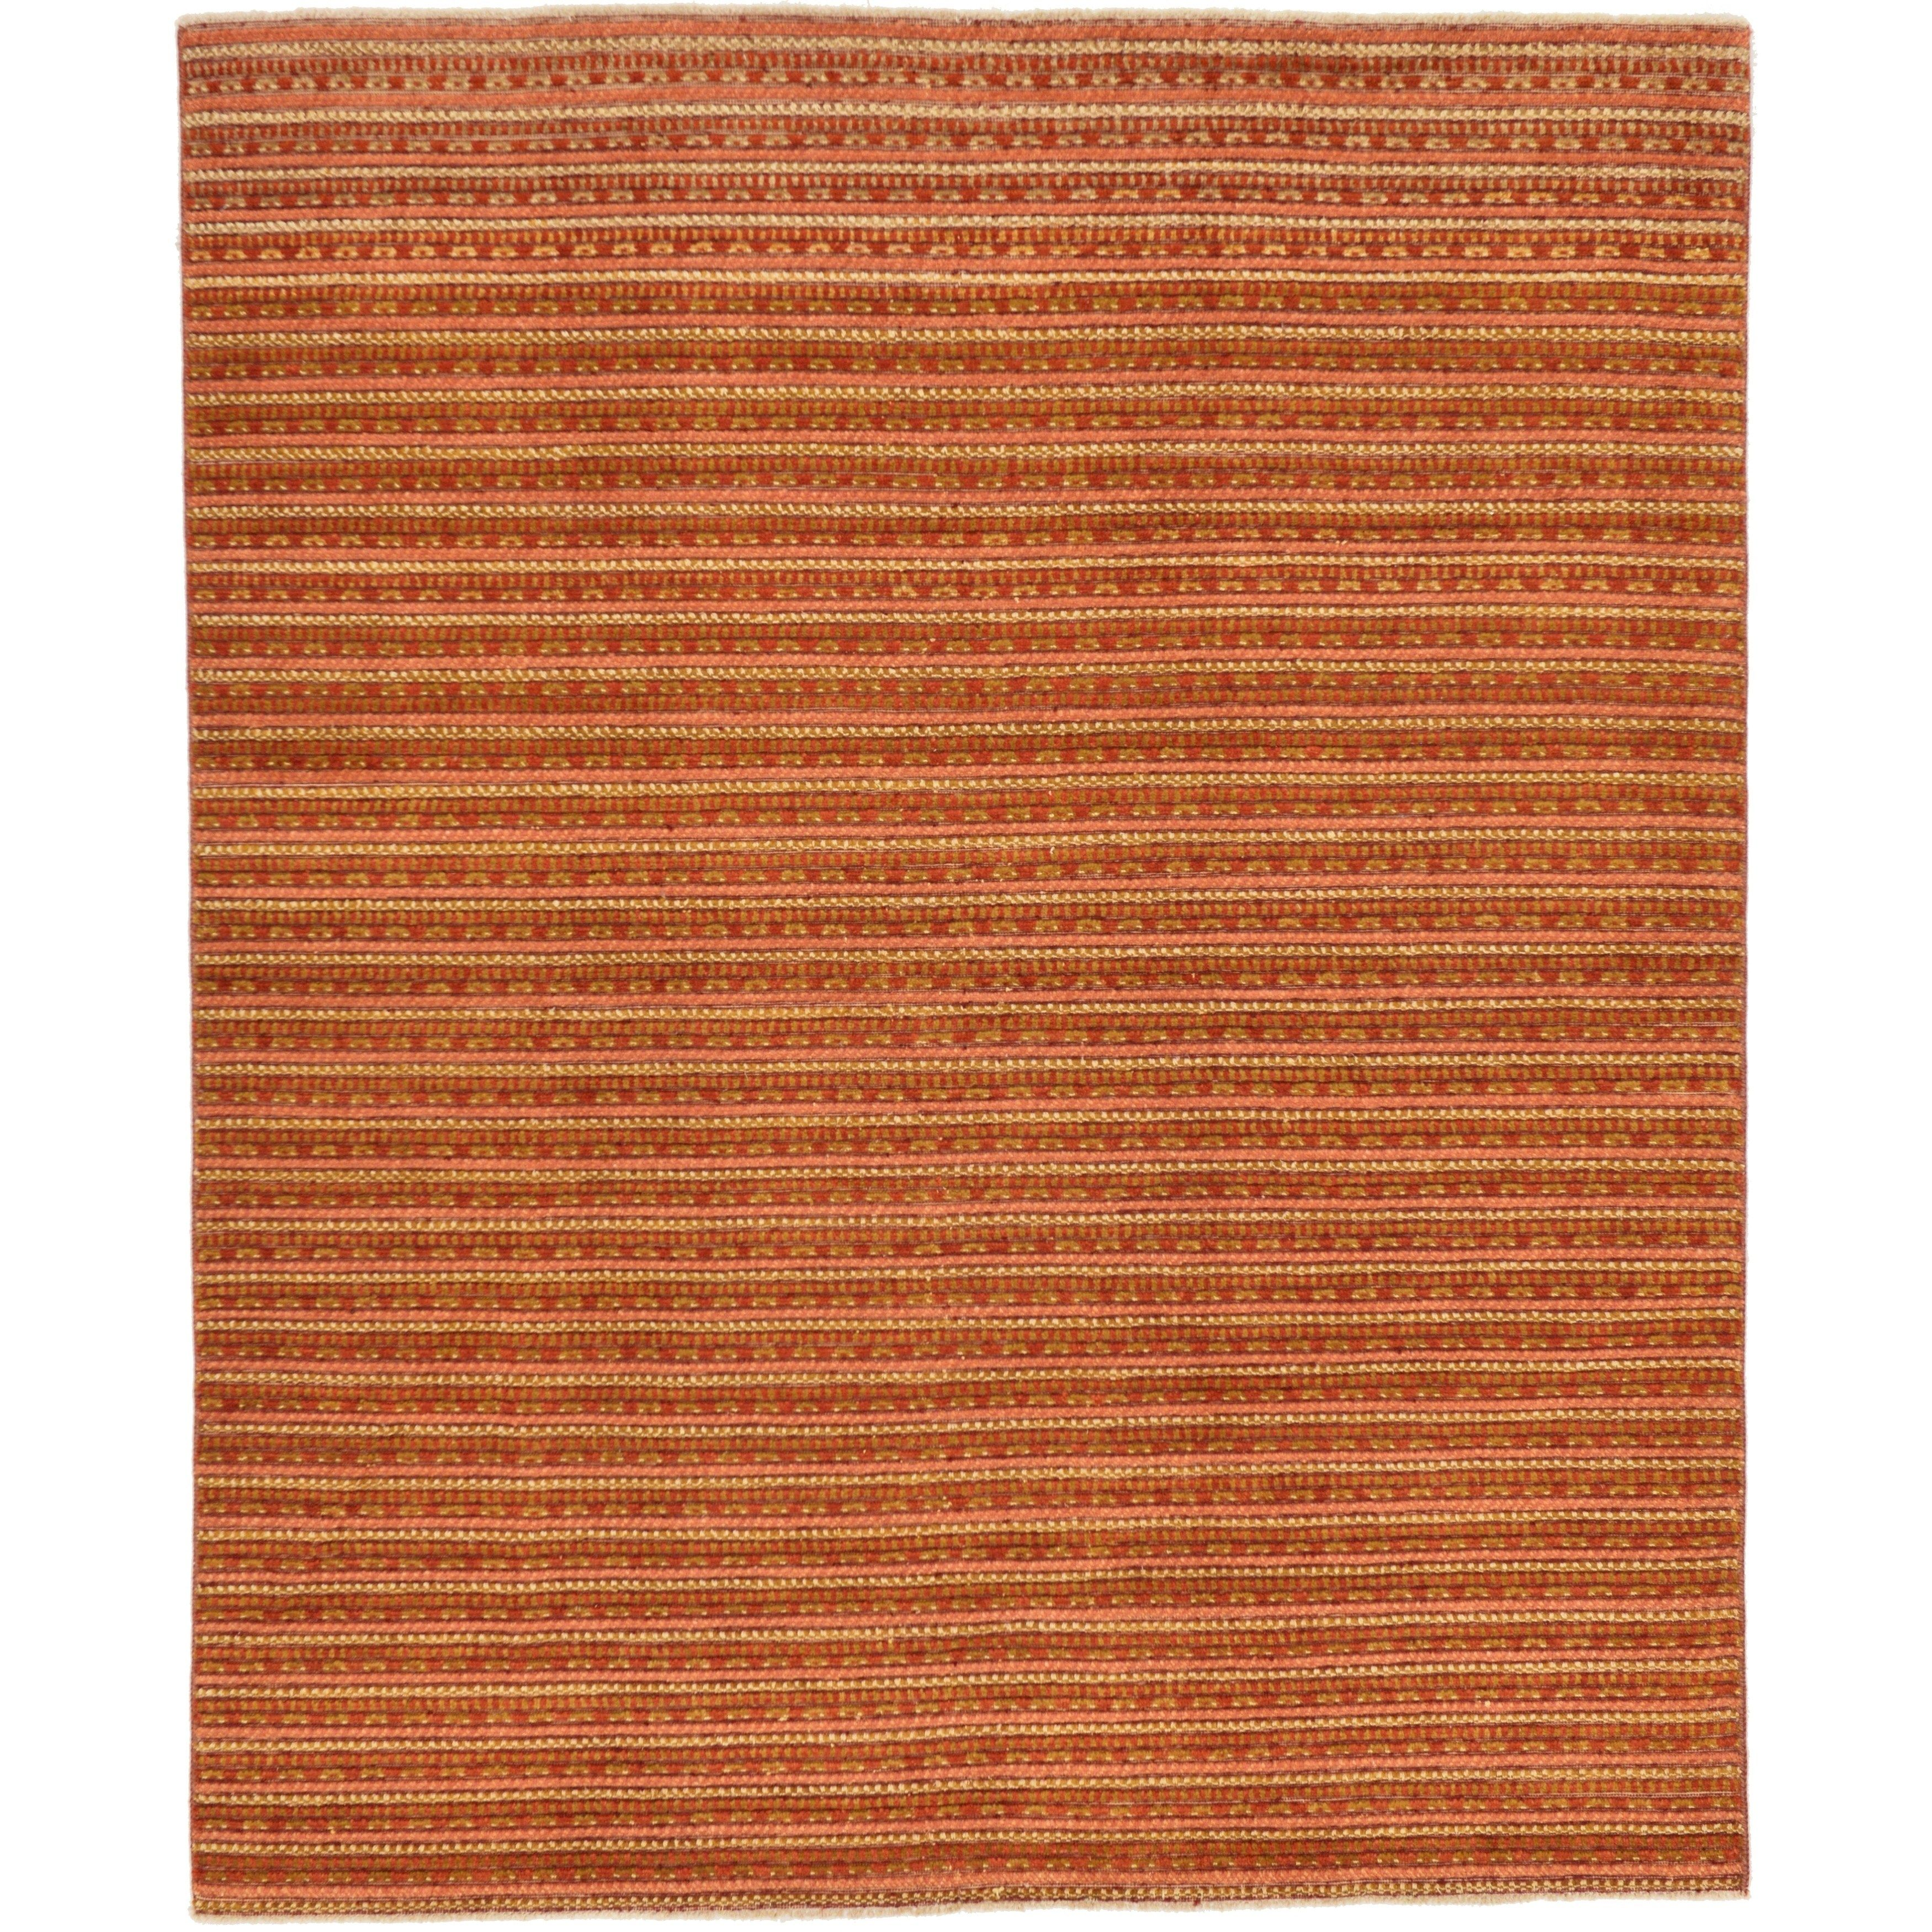 Refurbished Hand Knotted Modern Ziegler Silk Wool Area Rug 6